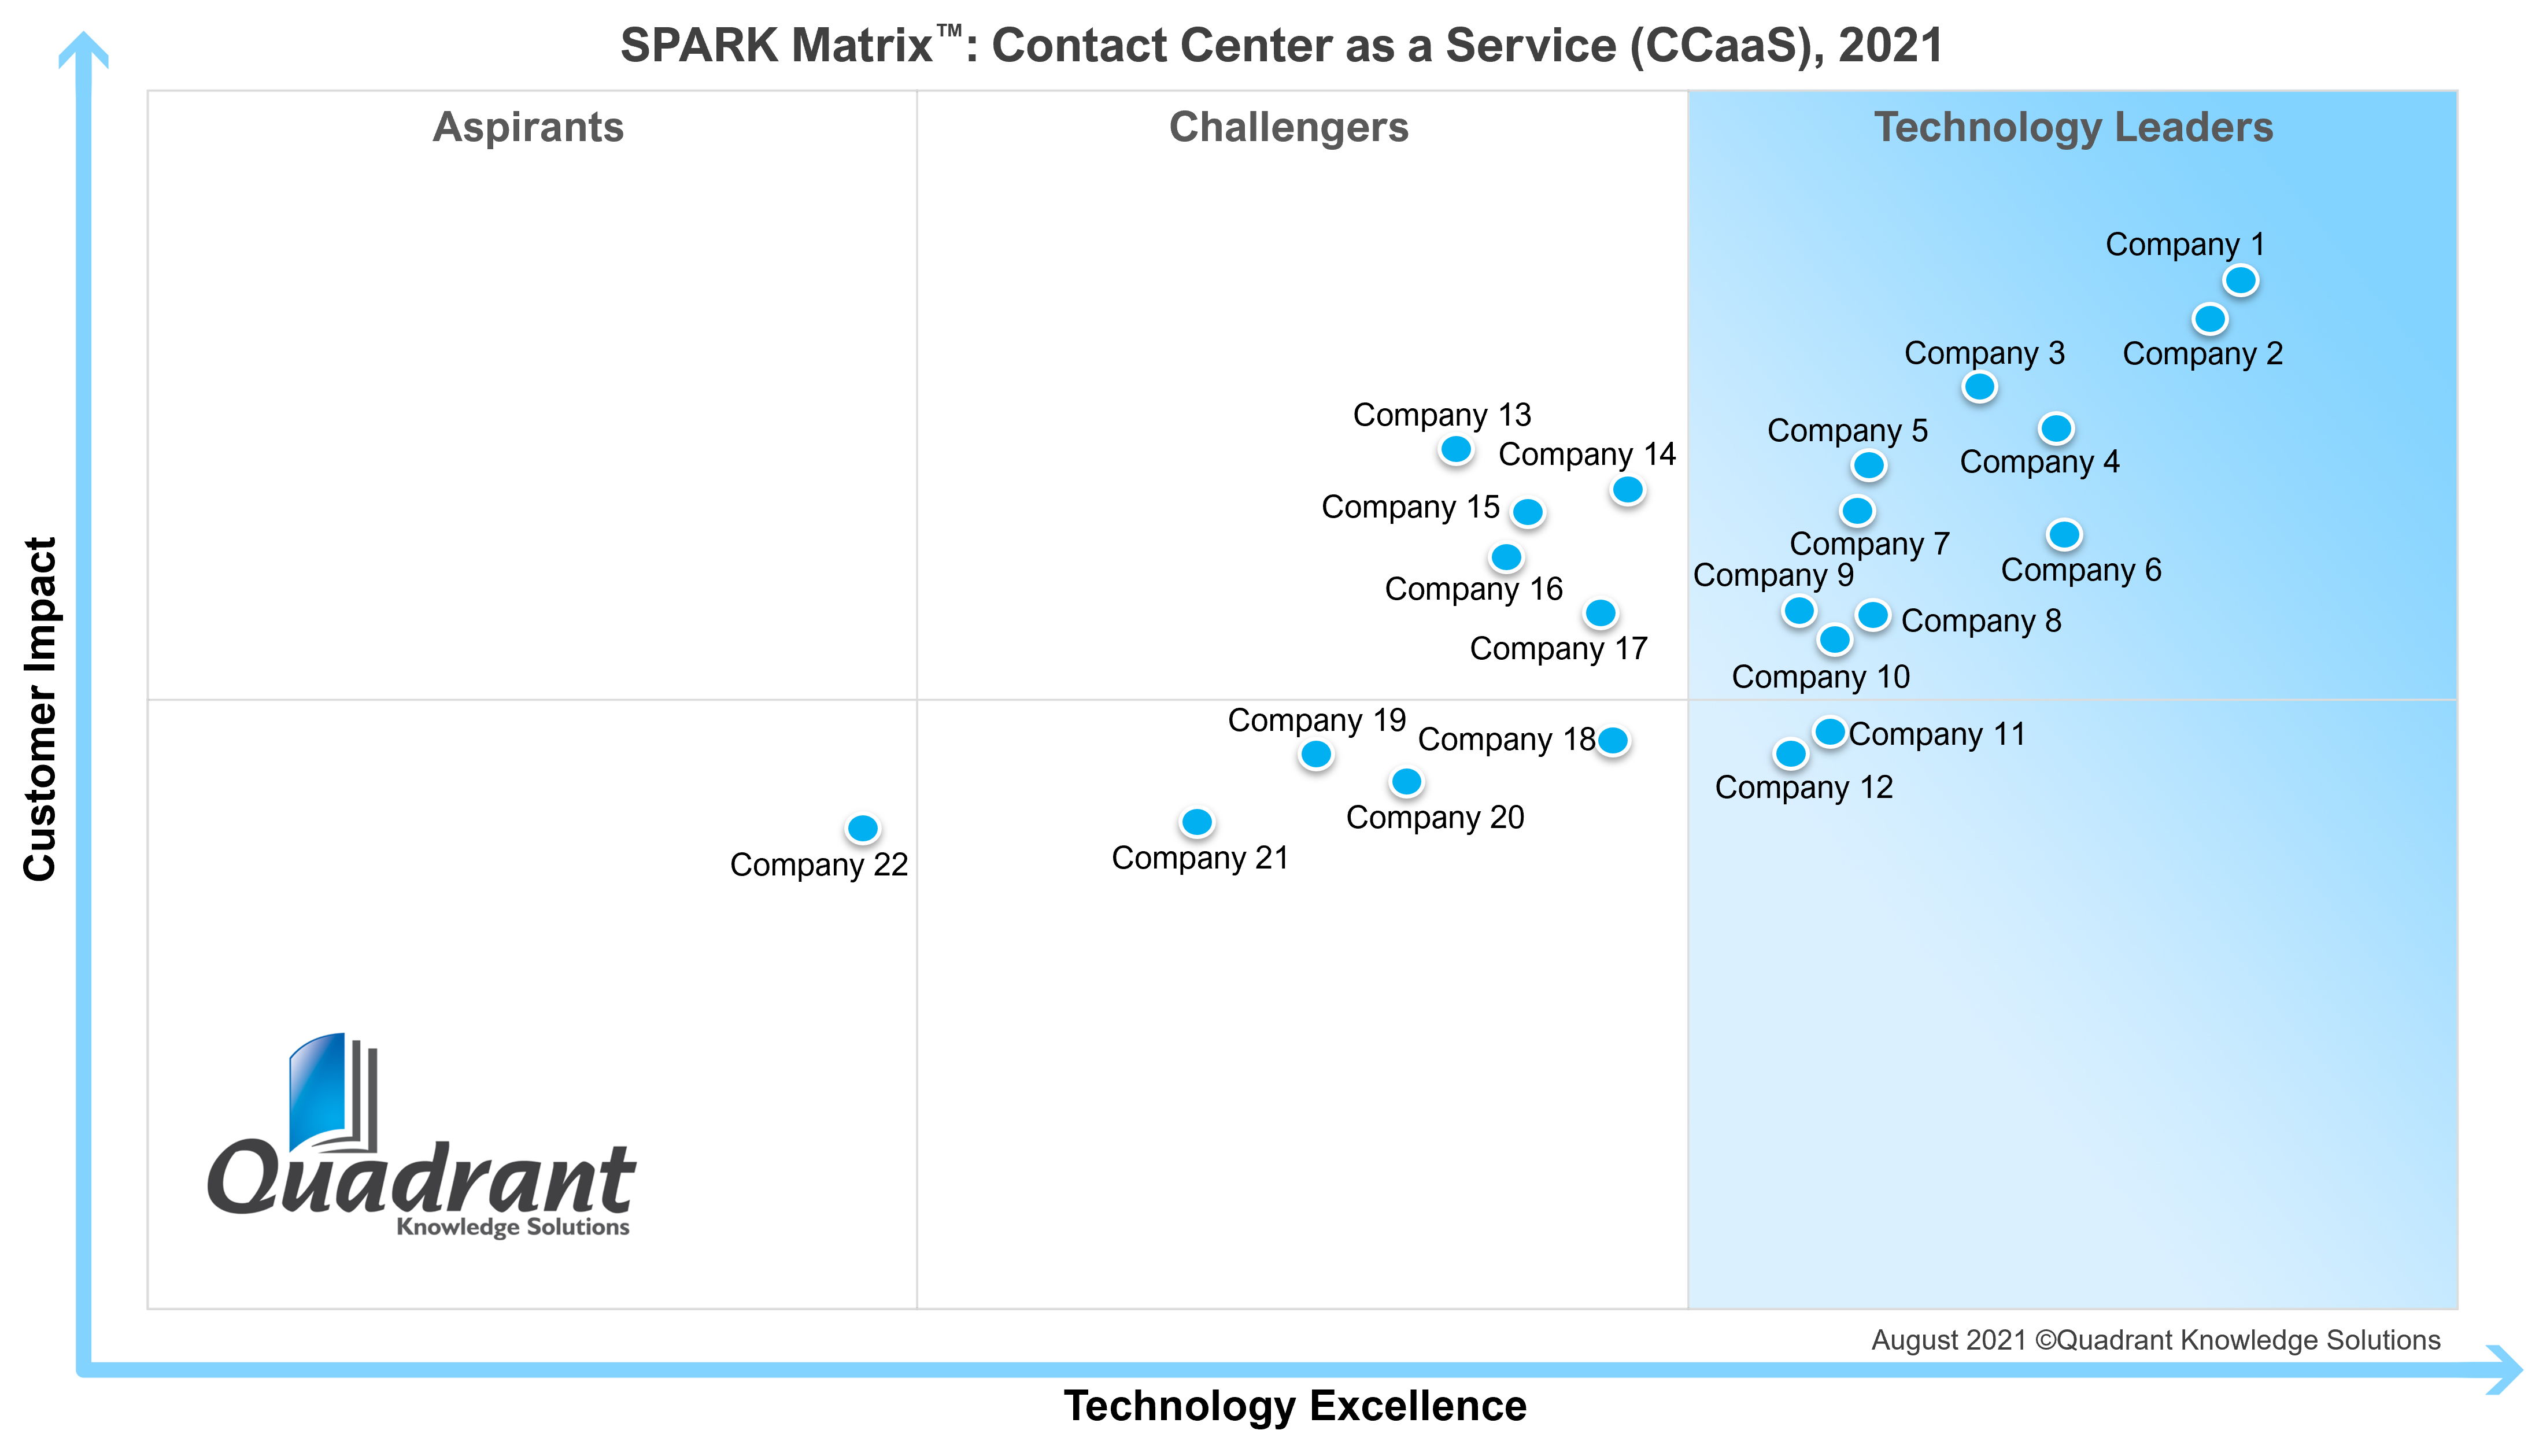 CCaaS_SPARK Matrix_2021